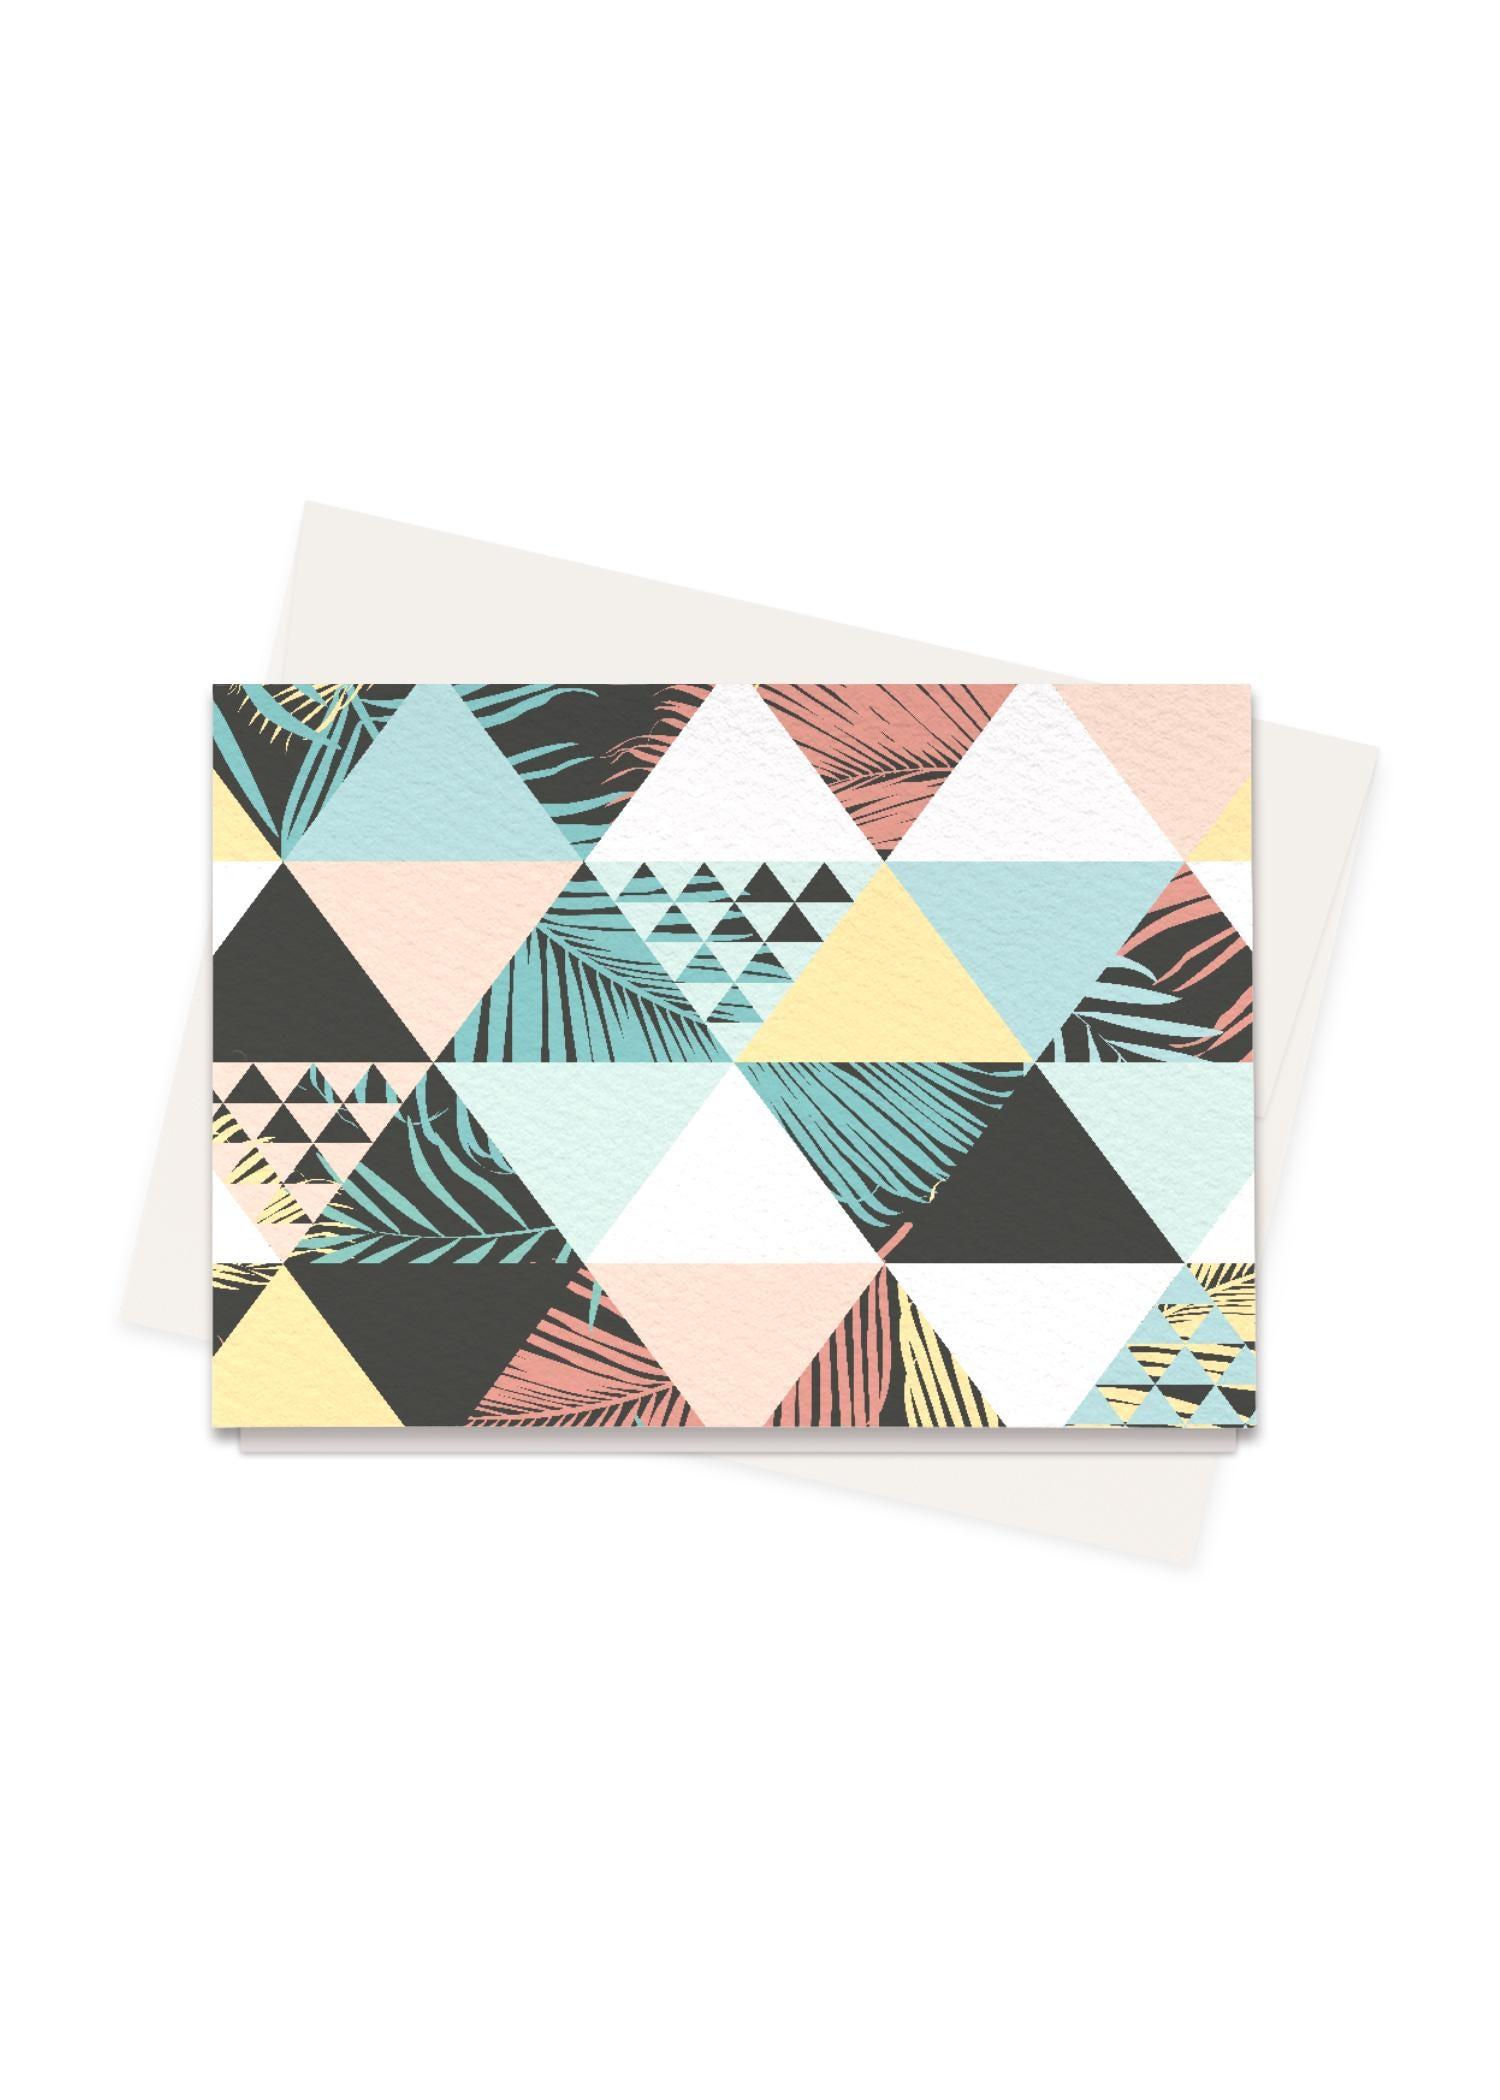 VIDA Greeting Cards Set - Beach Patchwork in Blue/Brown/Red by VIDA Original Artist  - Size: Set of 8